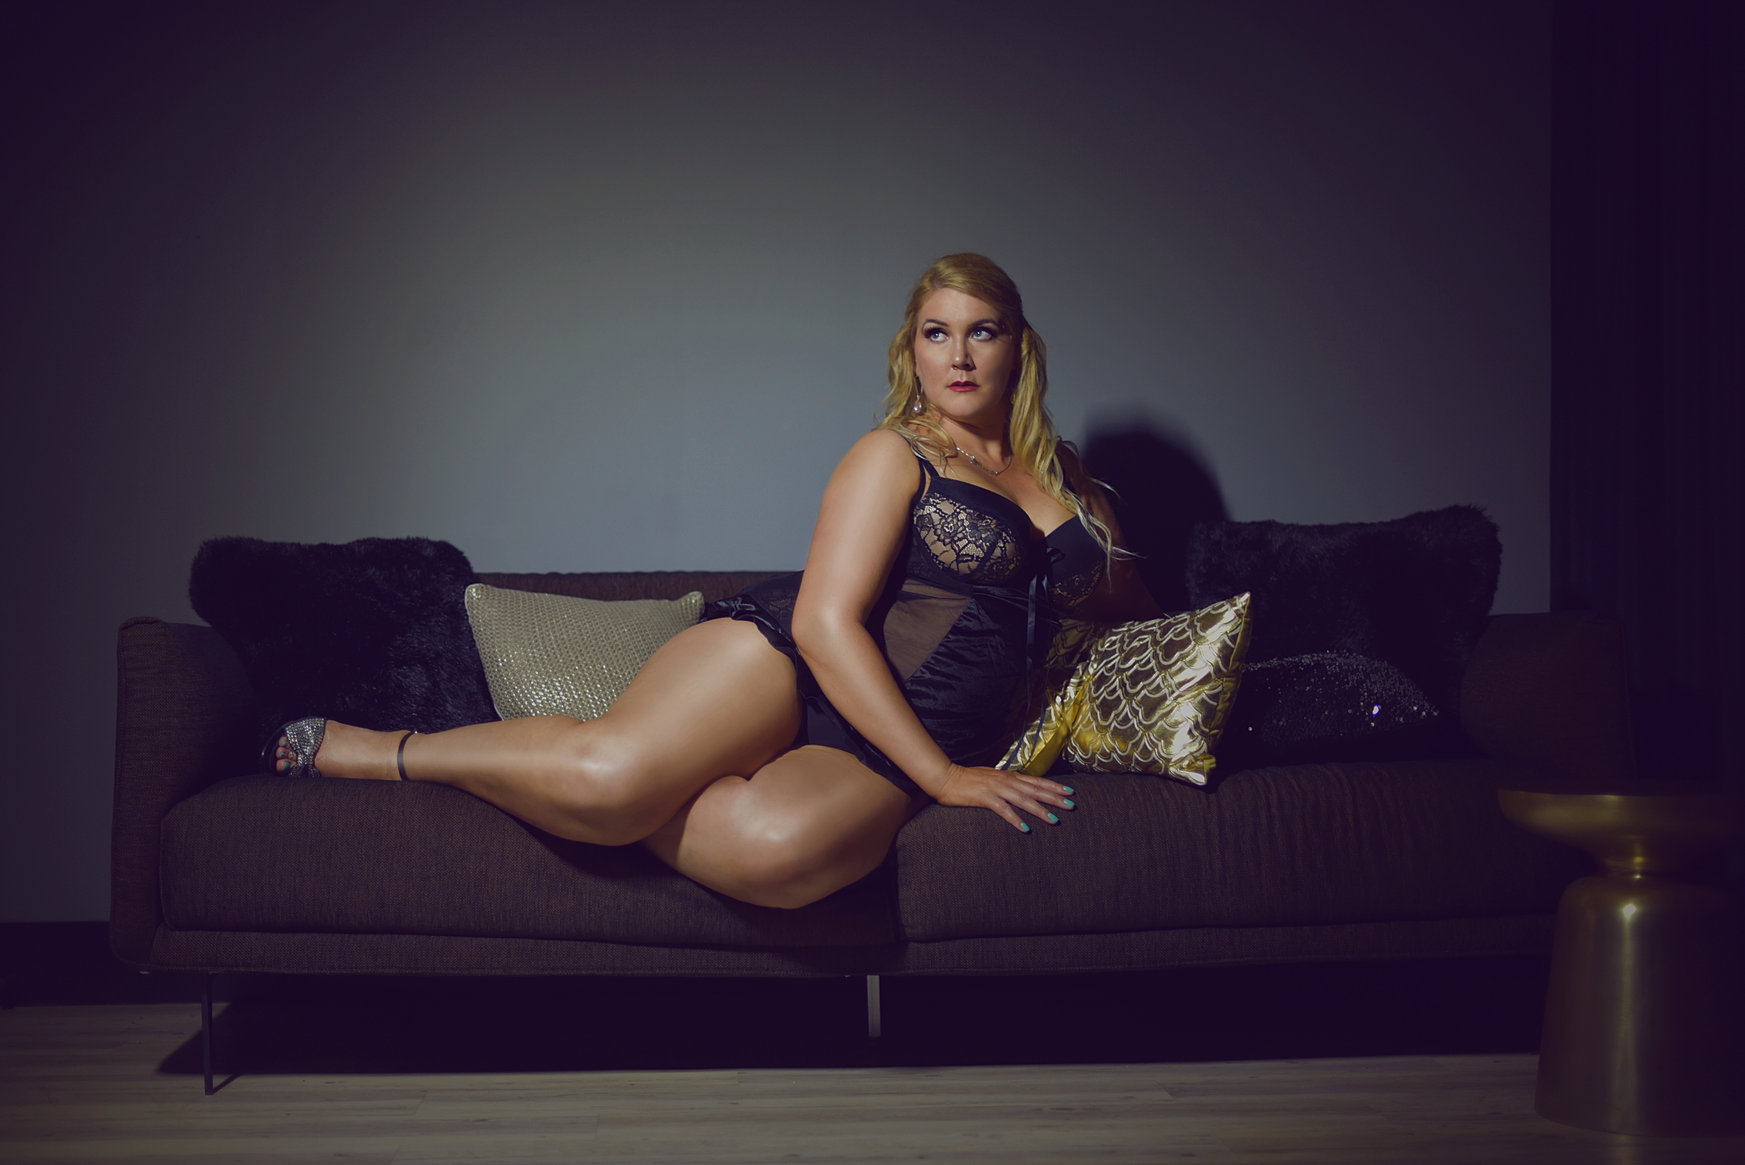 Noelle cooper slut mountain brook alabama